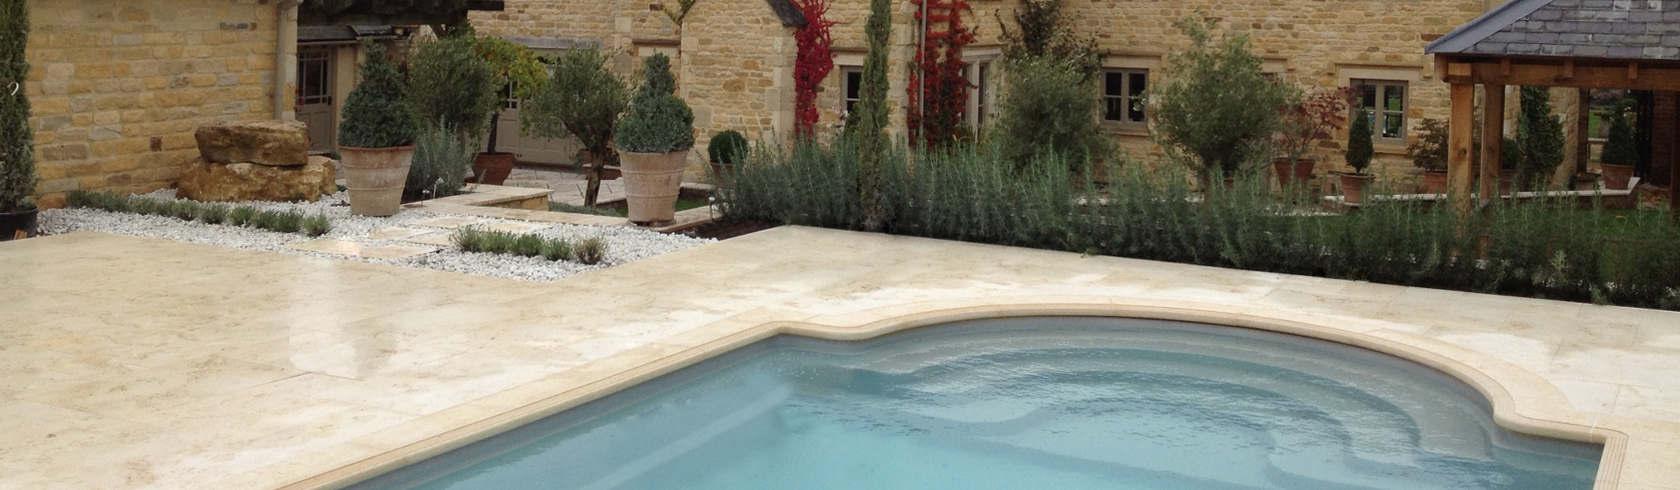 Award Winning Pool Installation